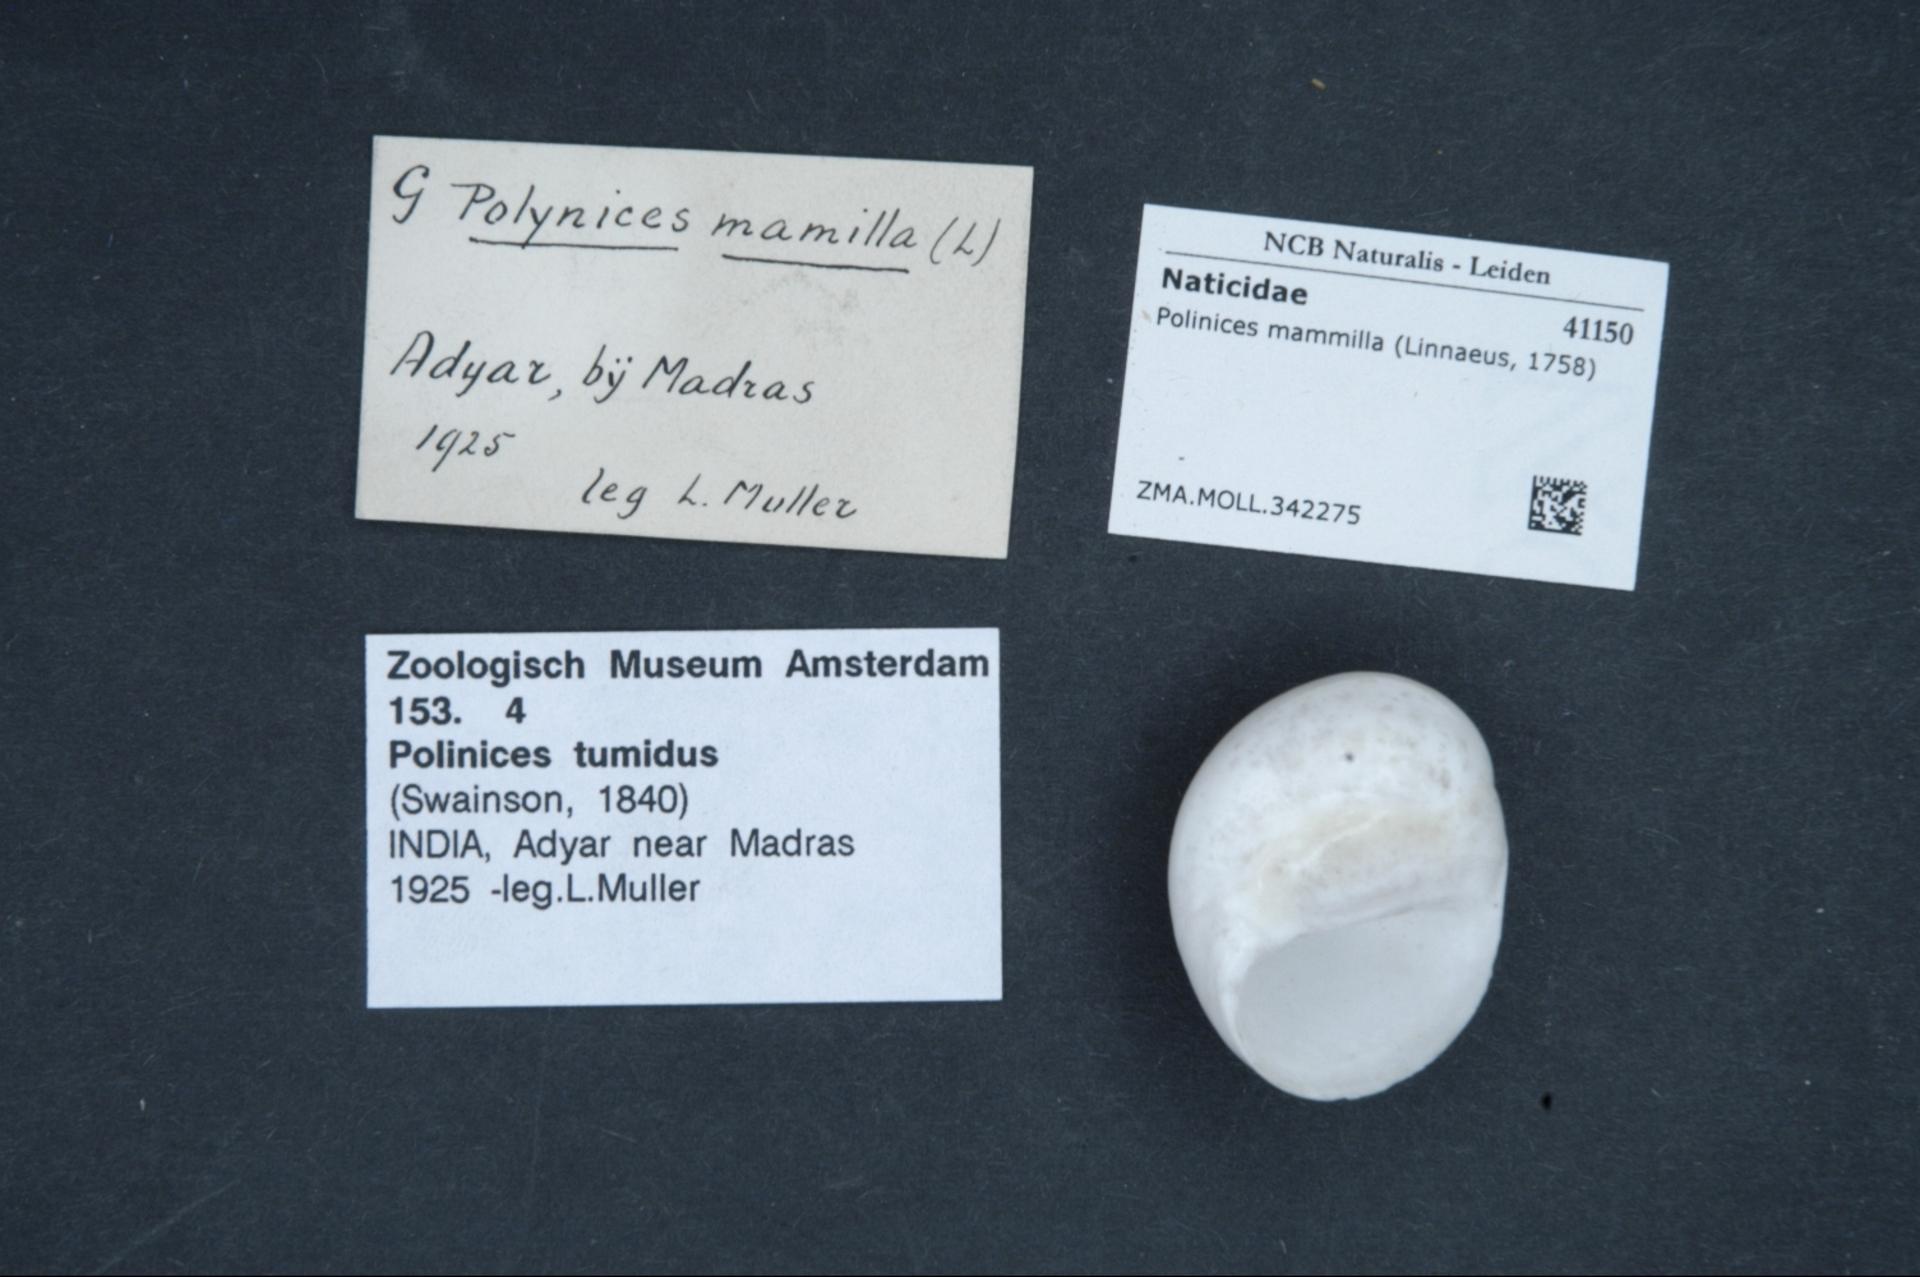 ZMA.MOLL.342275 | Polinices mammilla (Linnaeus, 1758)